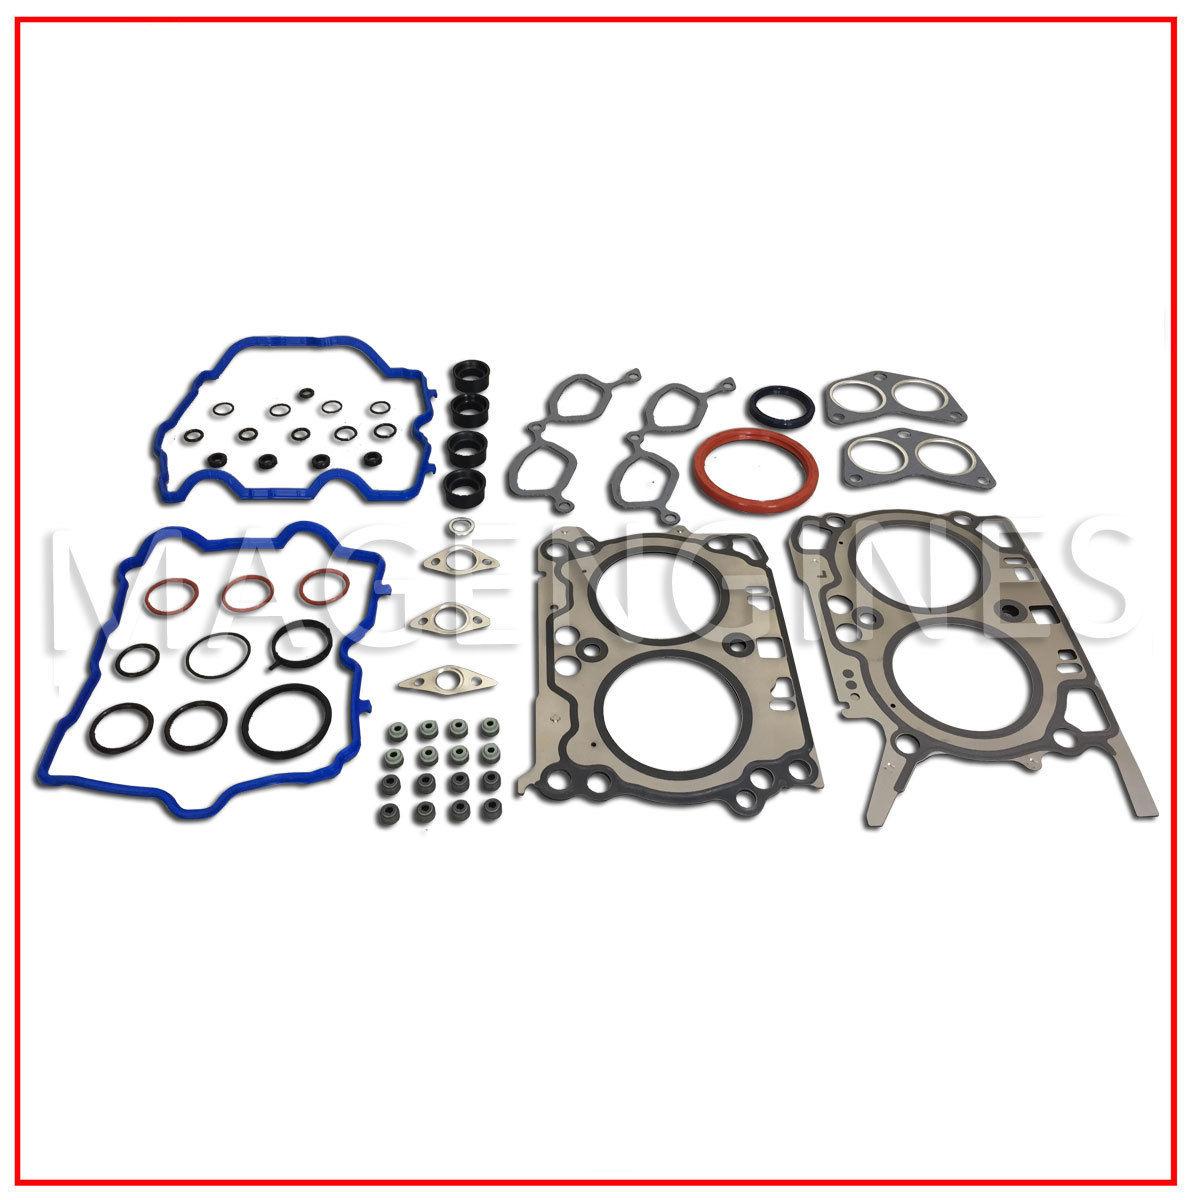 FULL HEAD GASKET KIT SUBARU FB25 DOHC 16V 2 5 LTR 3 – Mag Engines